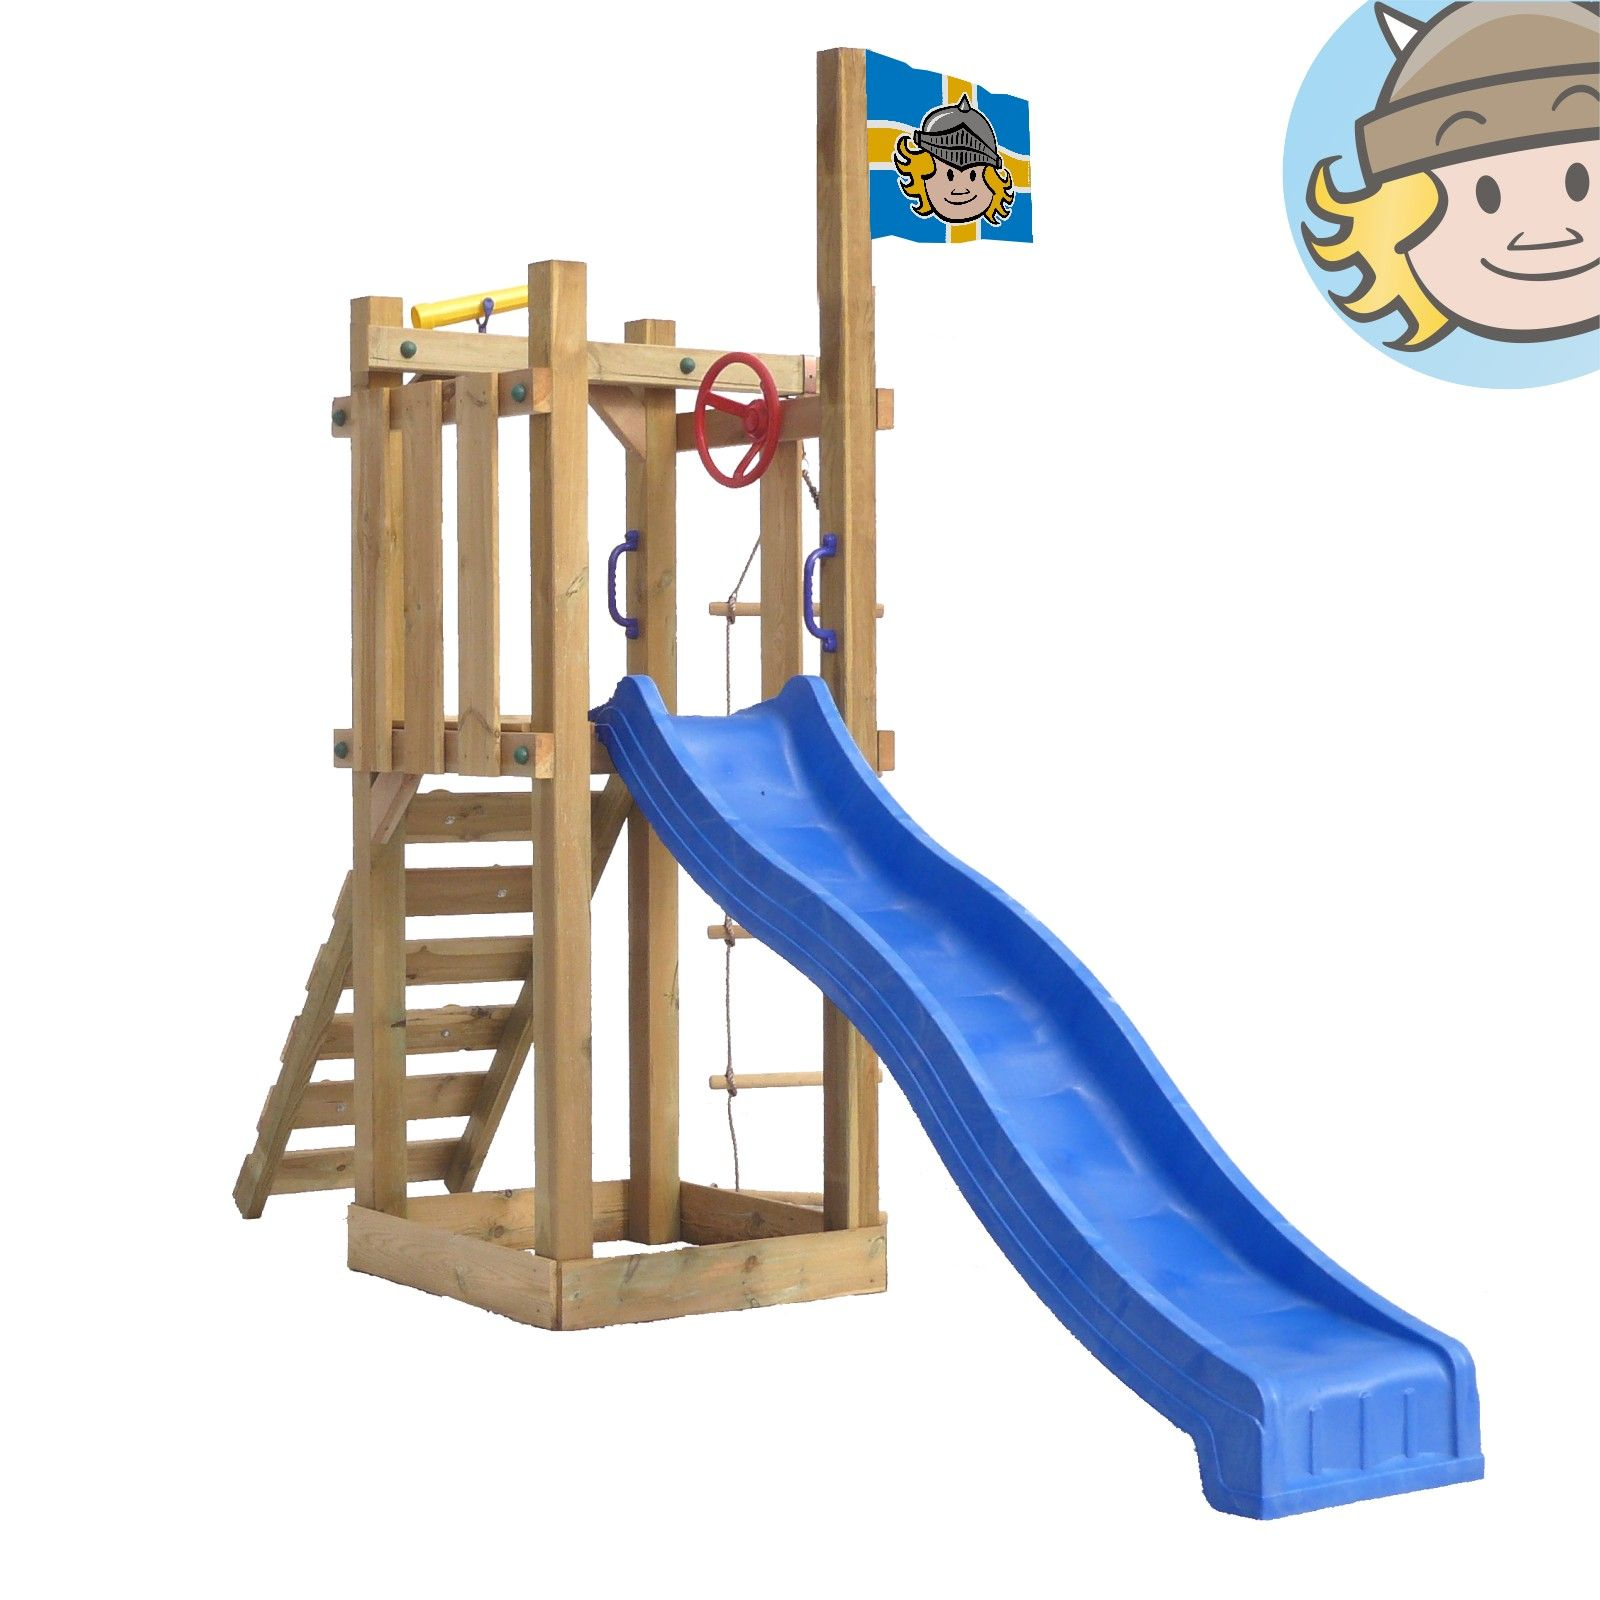 WICKEY Castle Minodor Climbing Frame Slide sandbox wooden Set ...